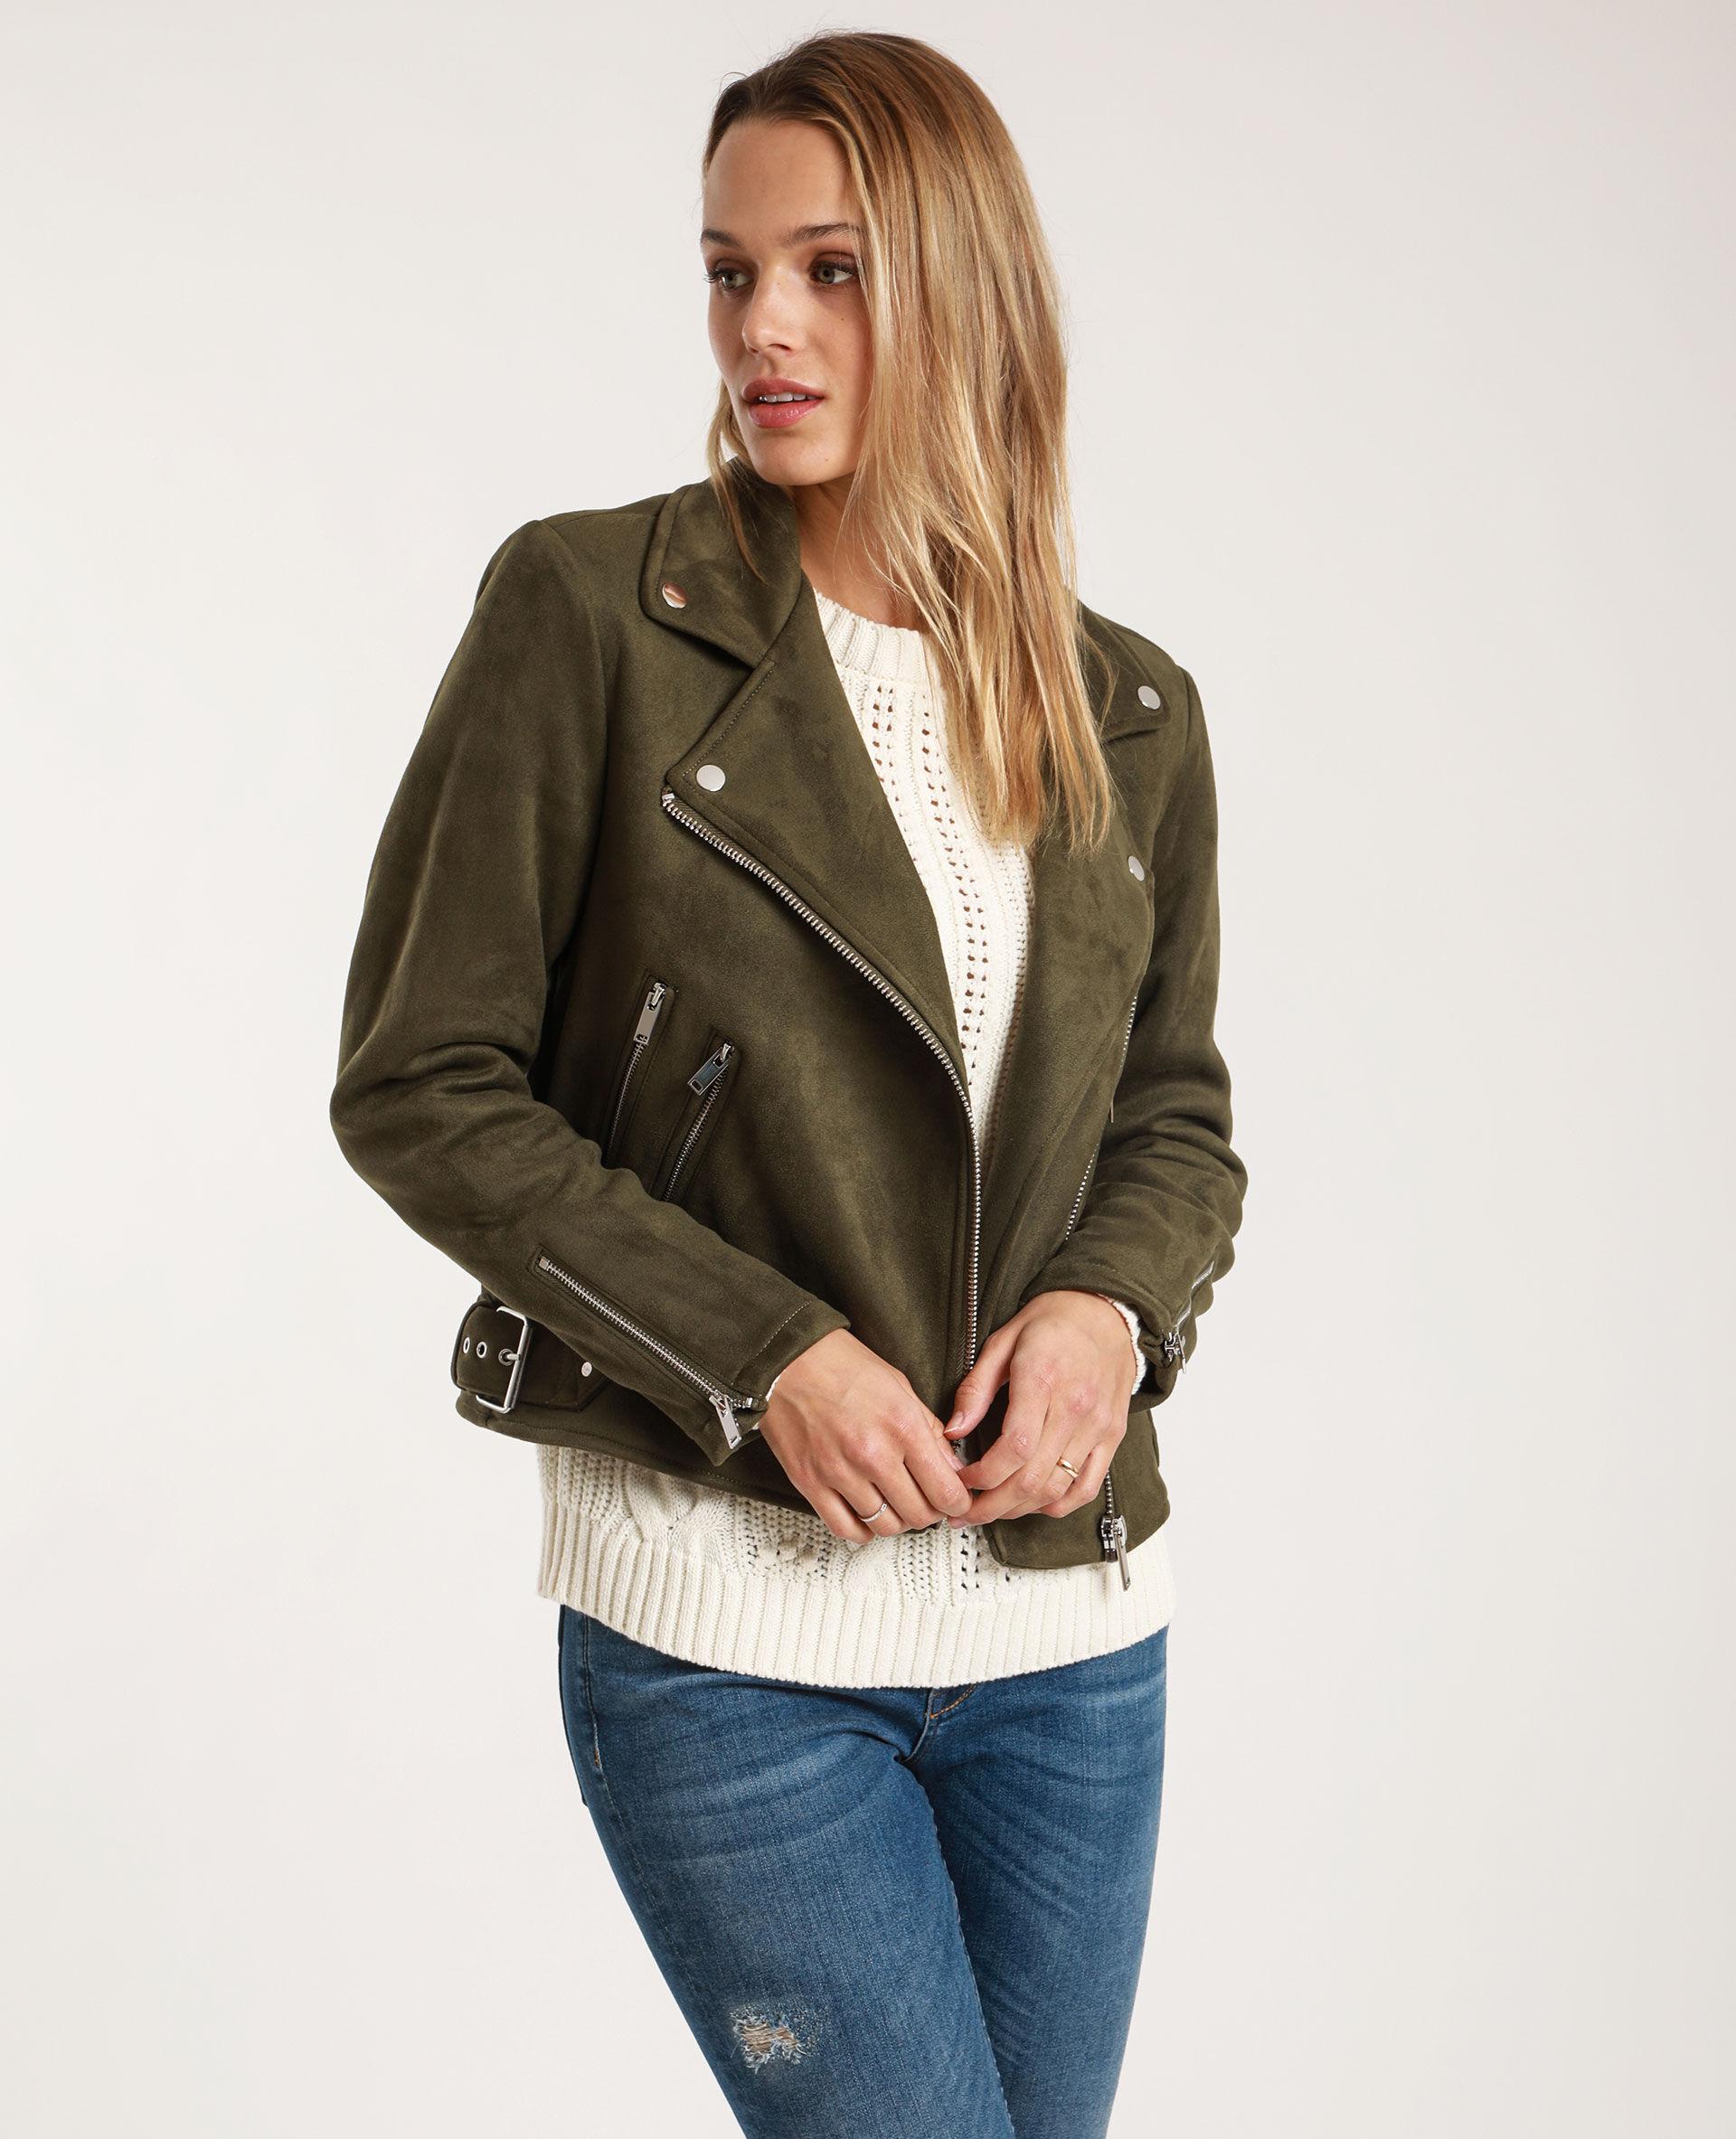 giacche donna pinchie